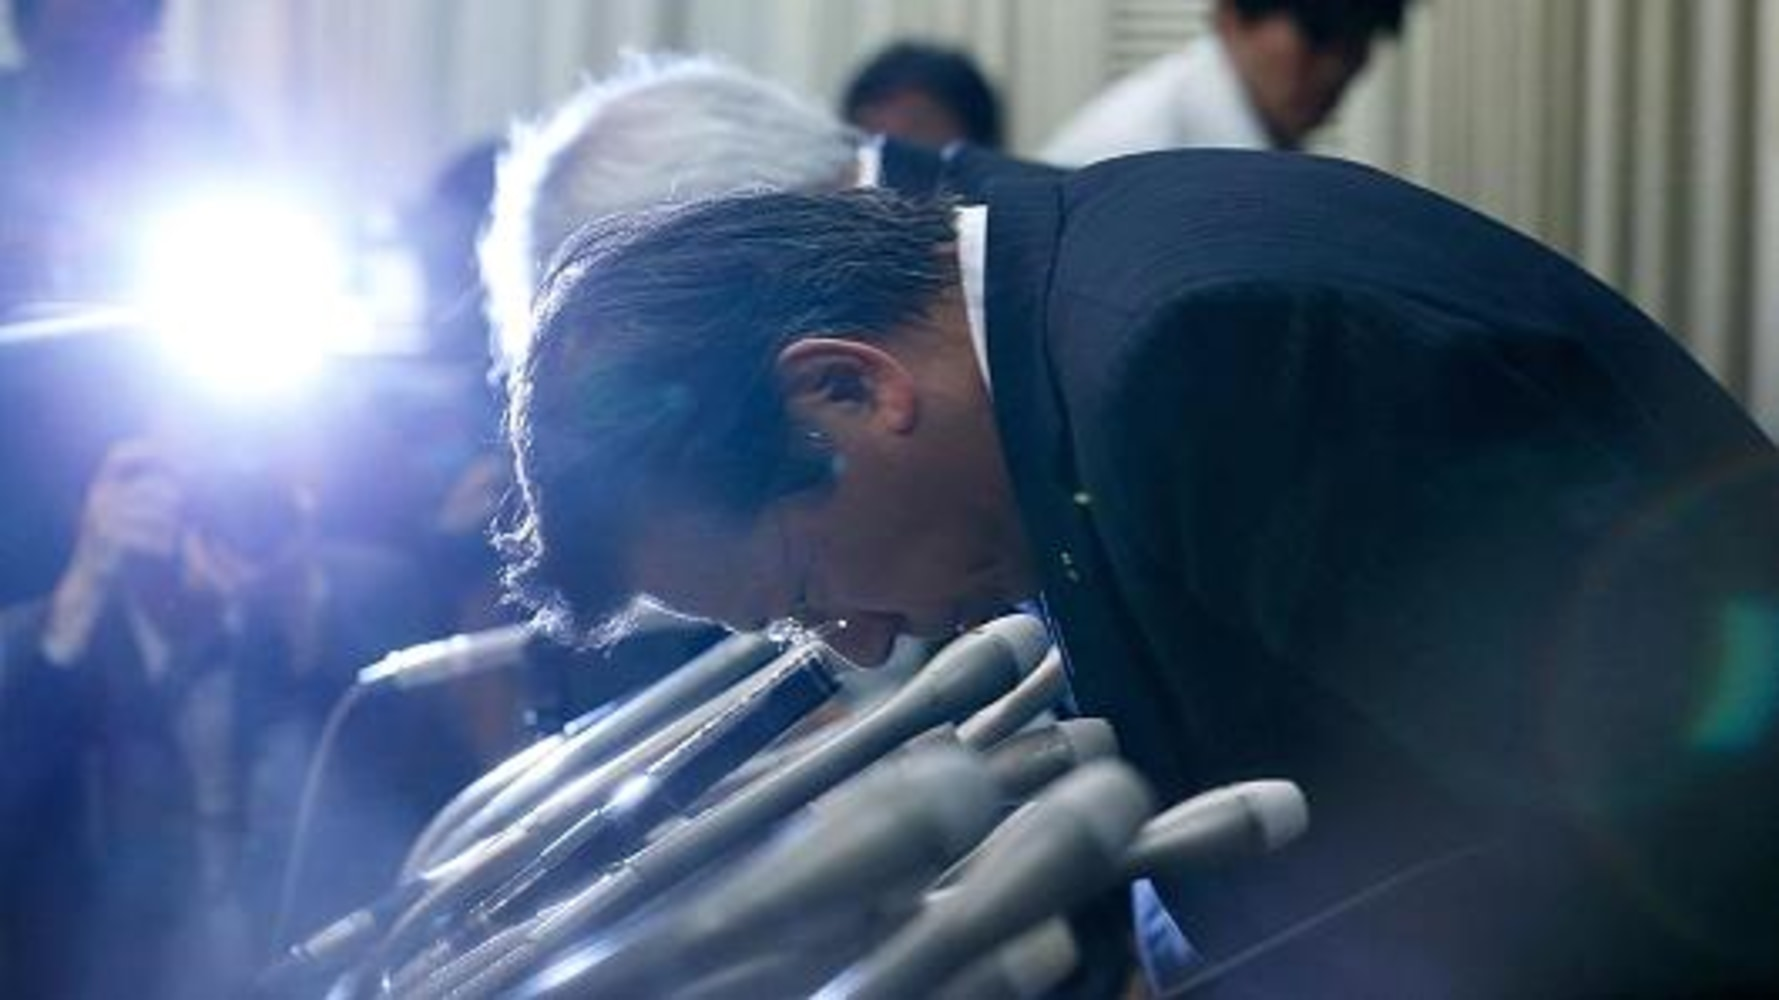 Mitsubishi Shares Take a $2.5B Dive on Mileage Cheating Scandal